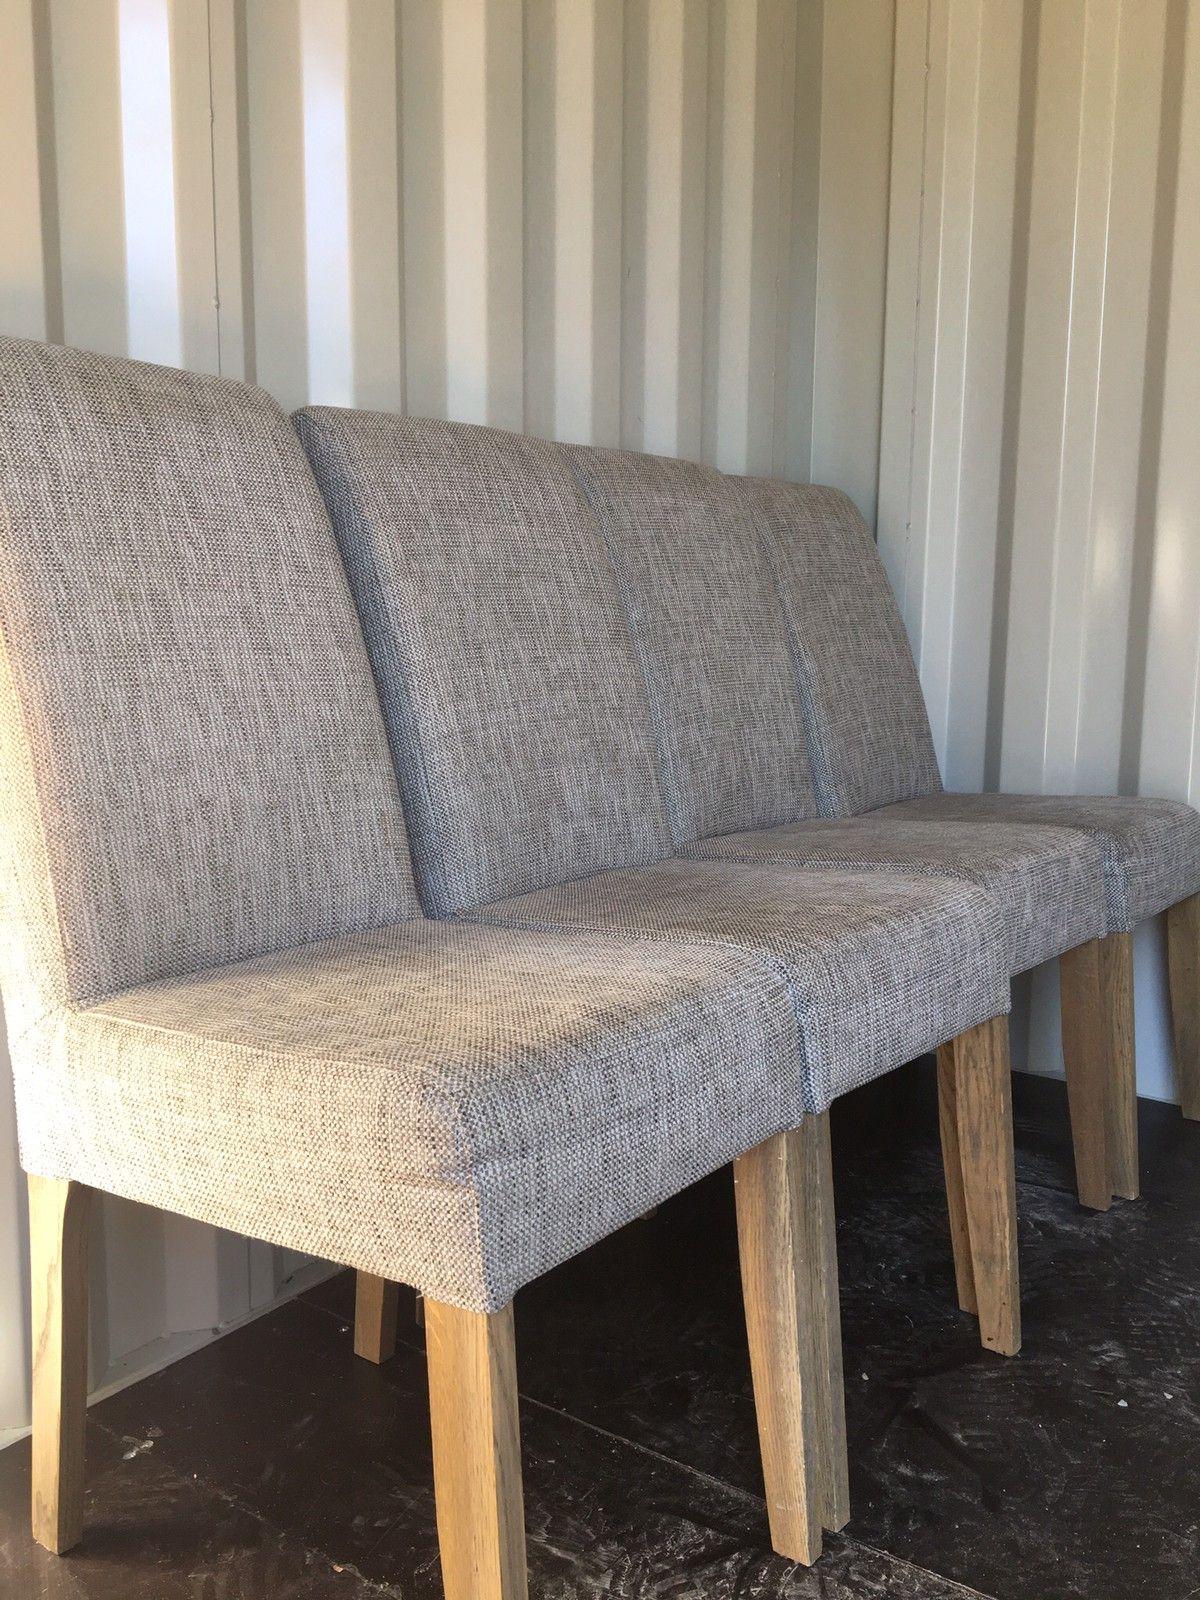 Grå Nowe spisestoler fra A møbler | FINN.no